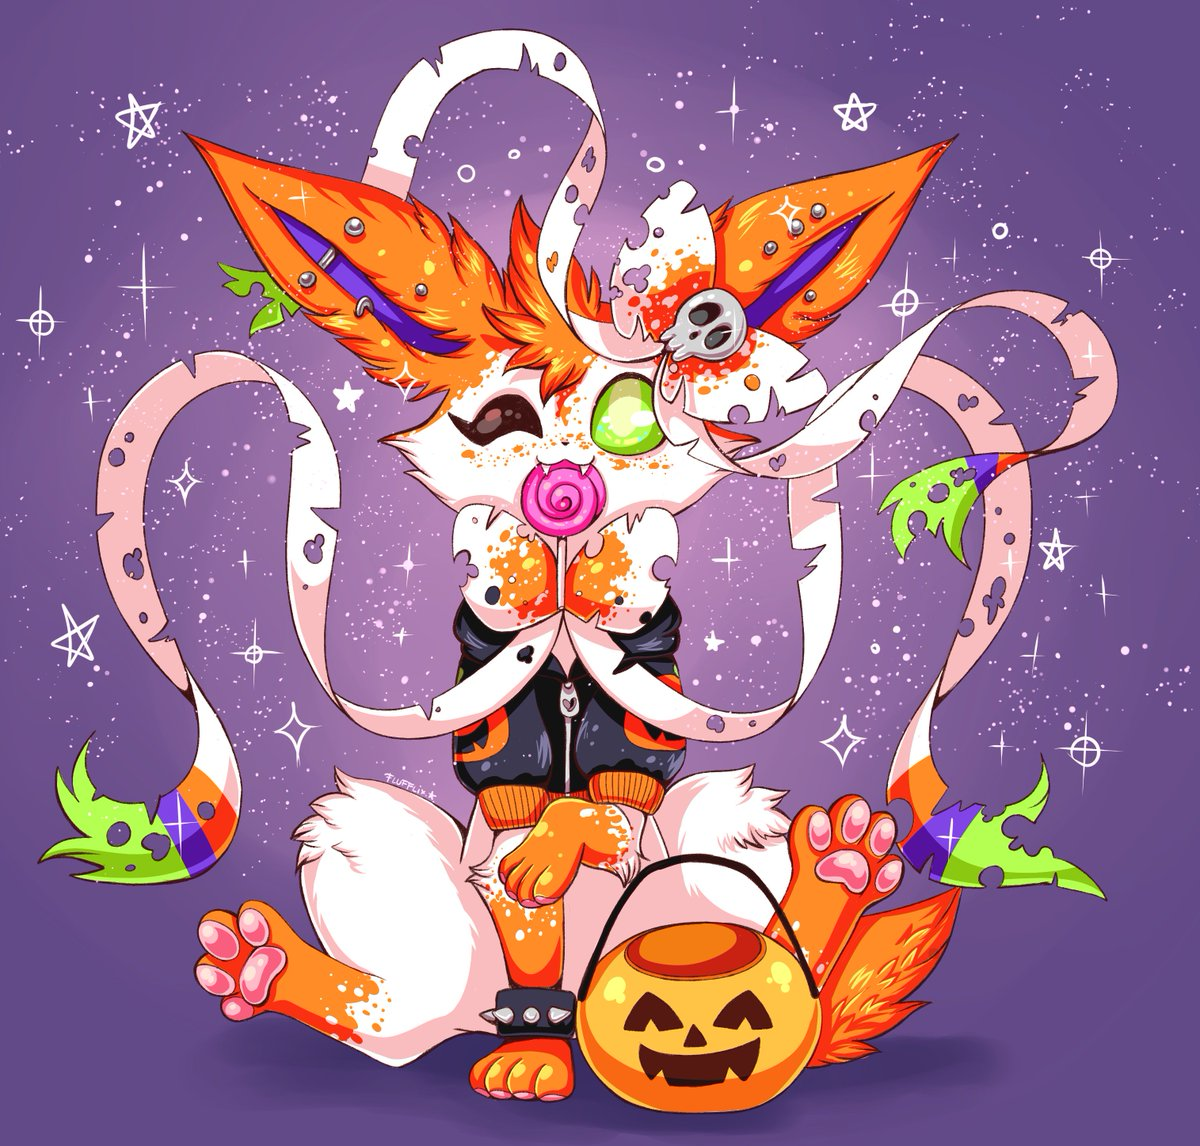 Twick or tweat!  #halloween #pokemon #sylveon<br>http://pic.twitter.com/xKoMwteGdg